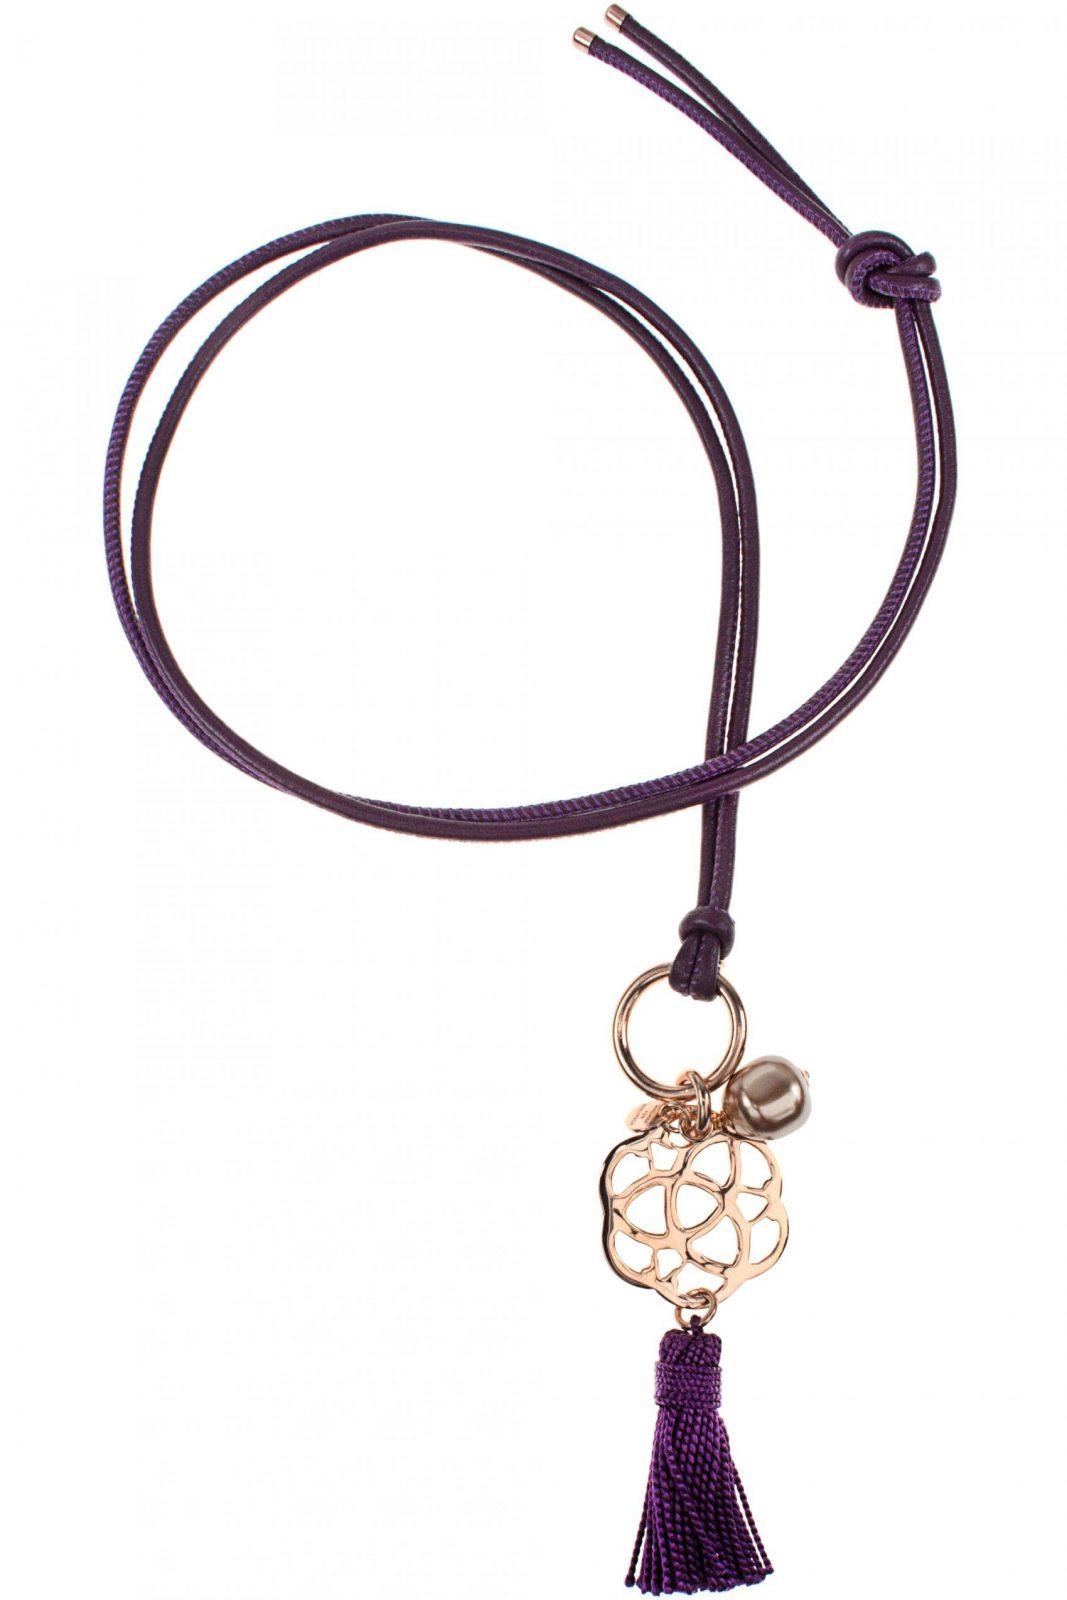 Tila Lederkette Quaste Violett Blume Perle von Lange Kette Mit Quaste Photo